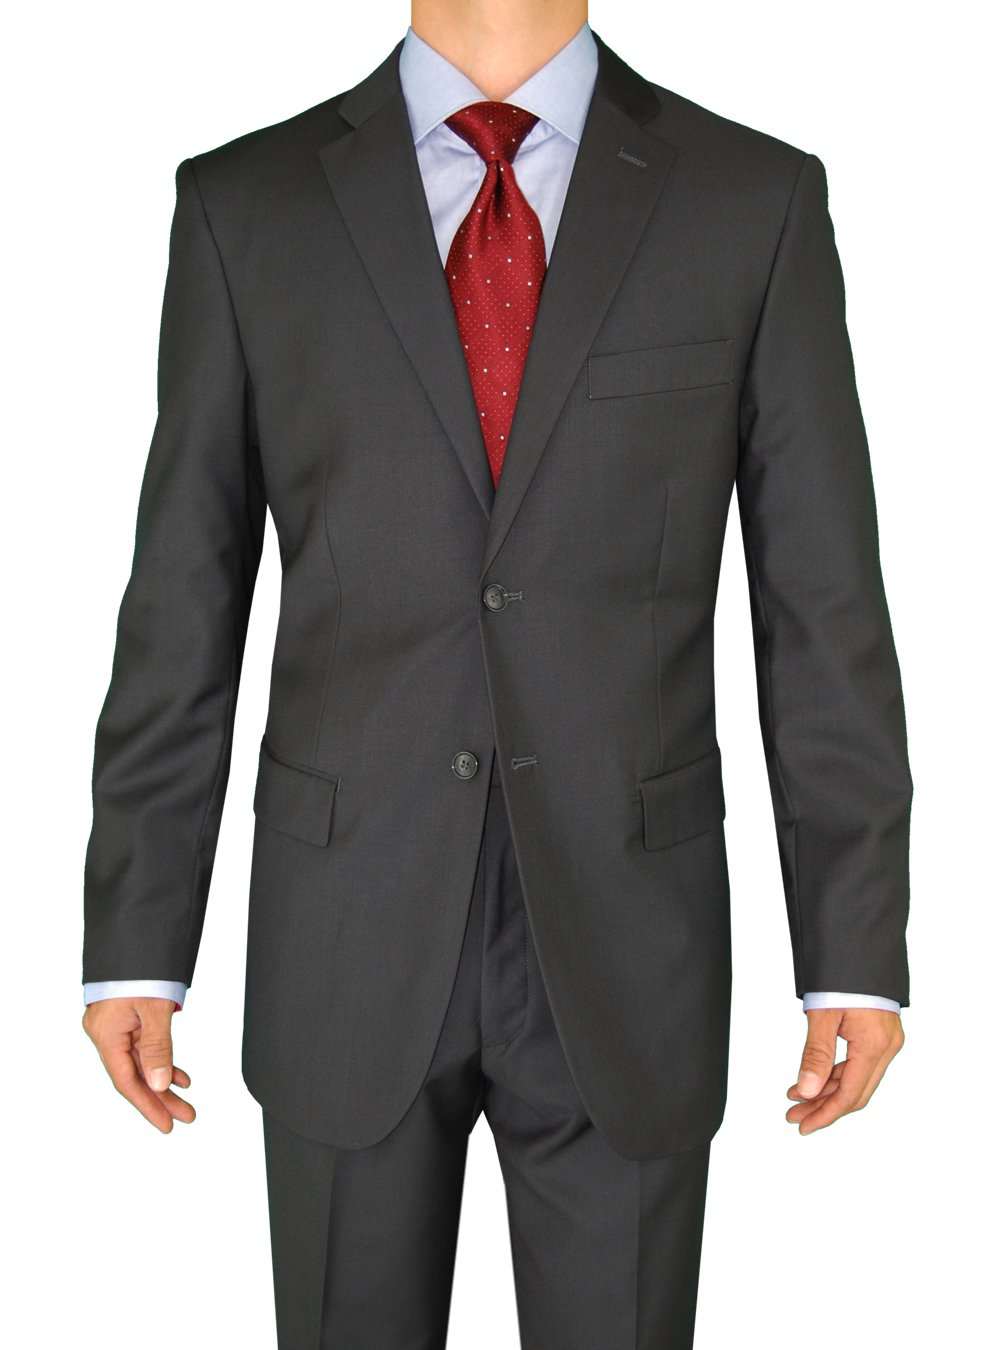 Fuomo Business Classic Men's Suit 2 Button 44R Charcoal